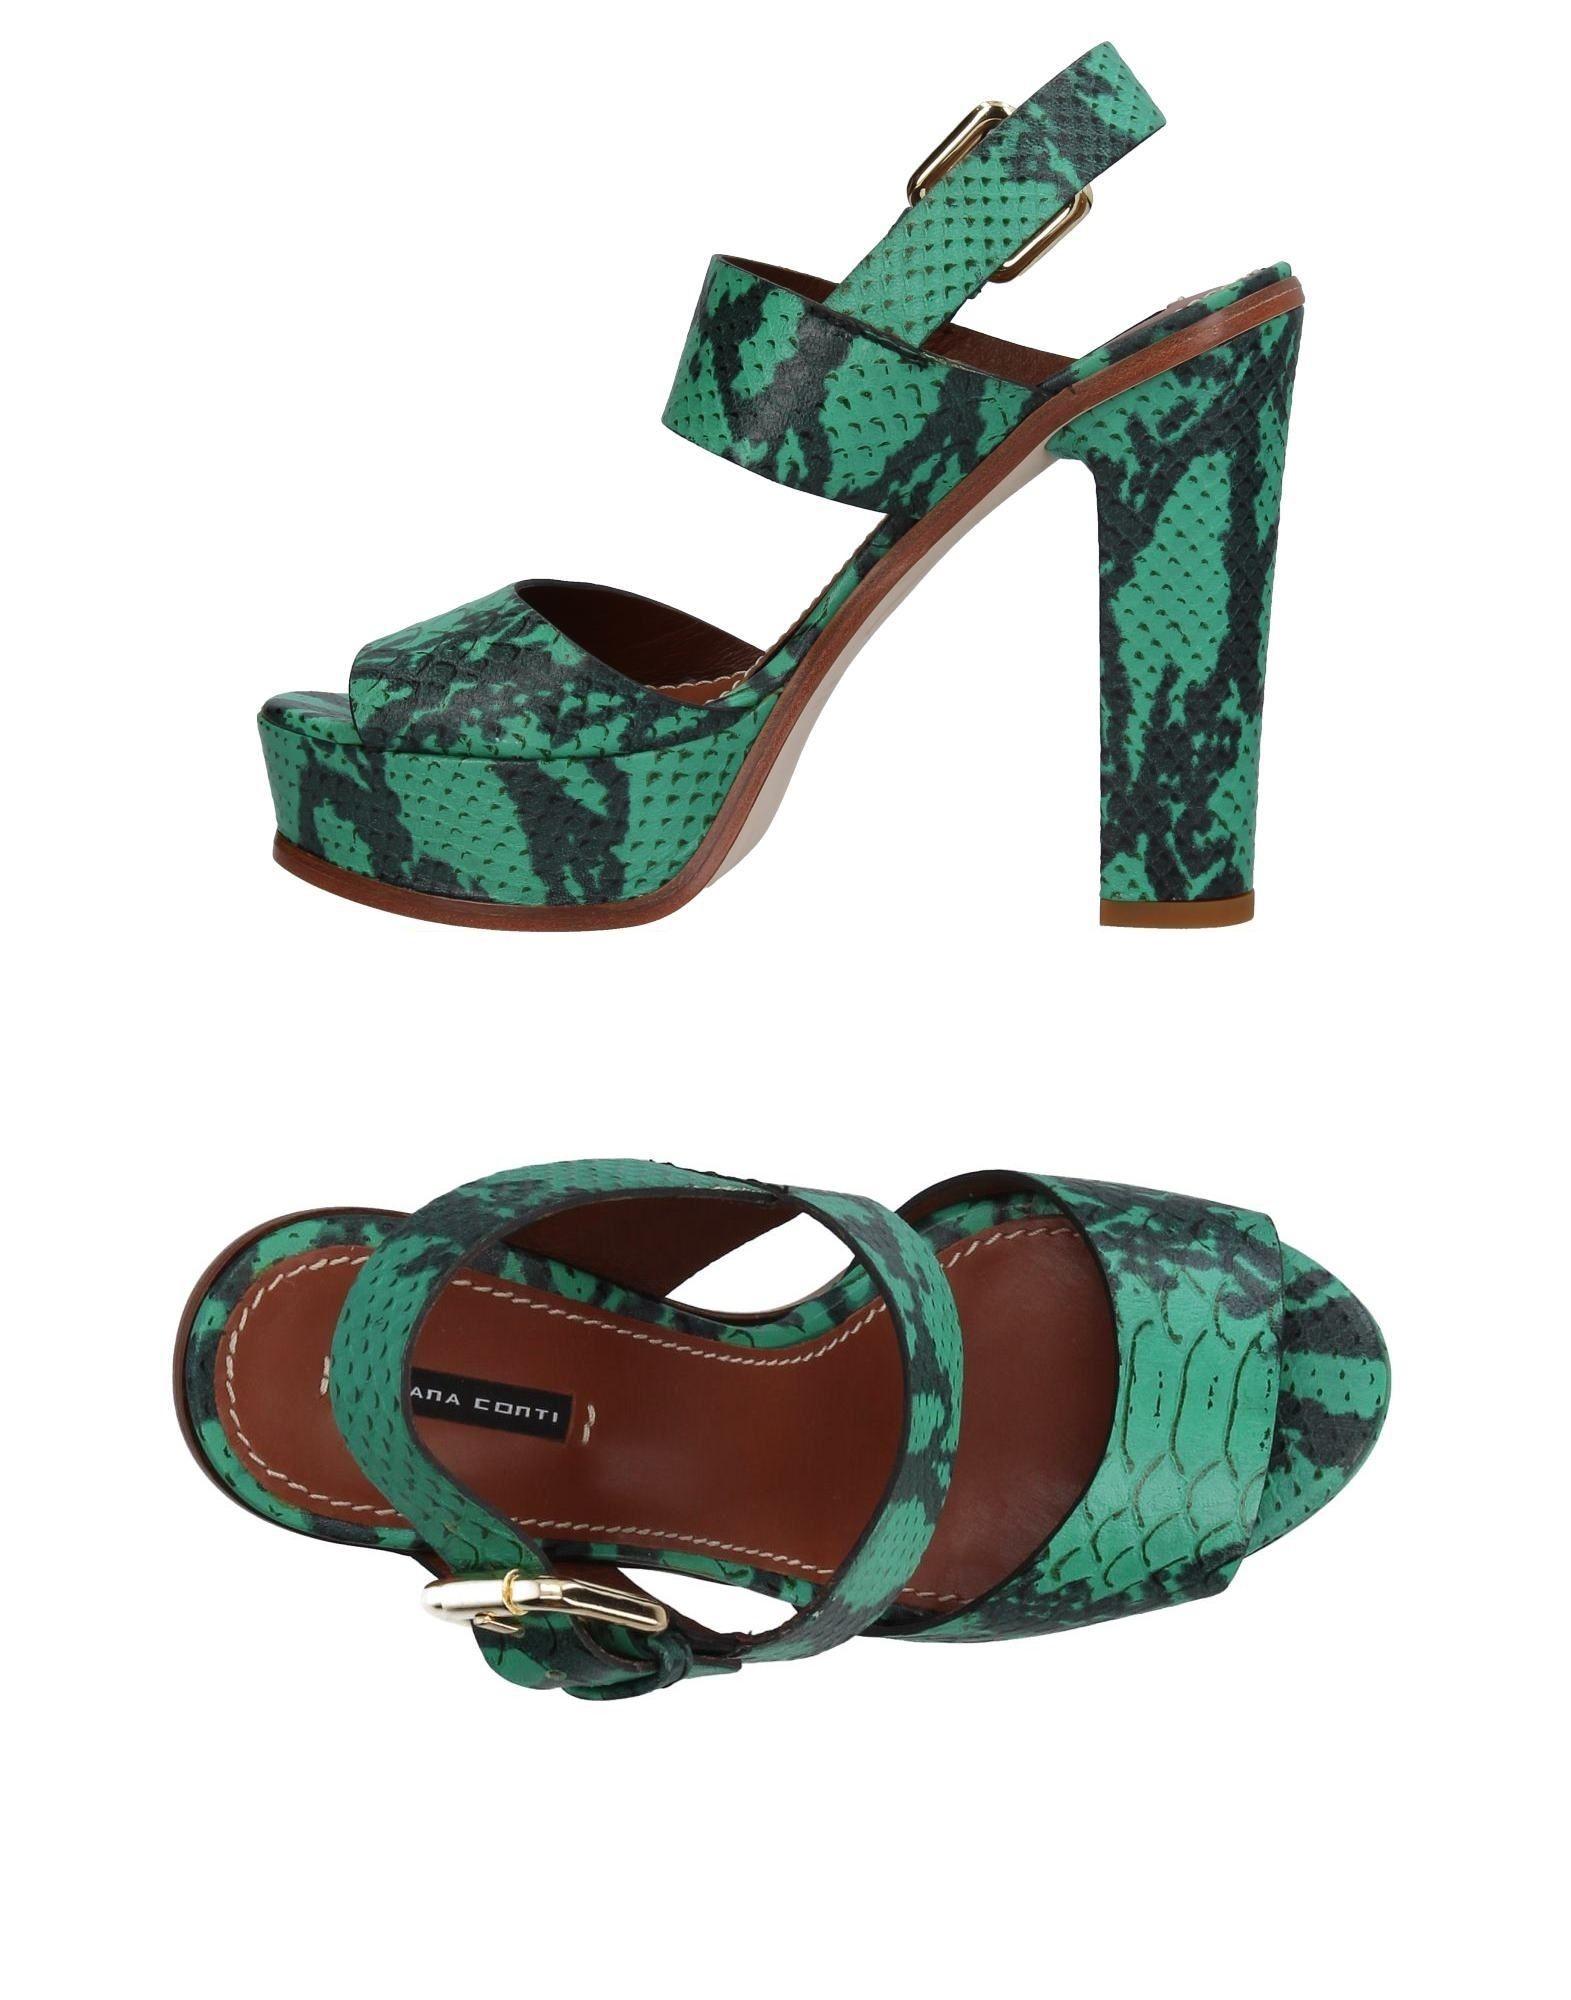 Sandales Post Orteils Liviana - Chaussures Conti 21WreBvw